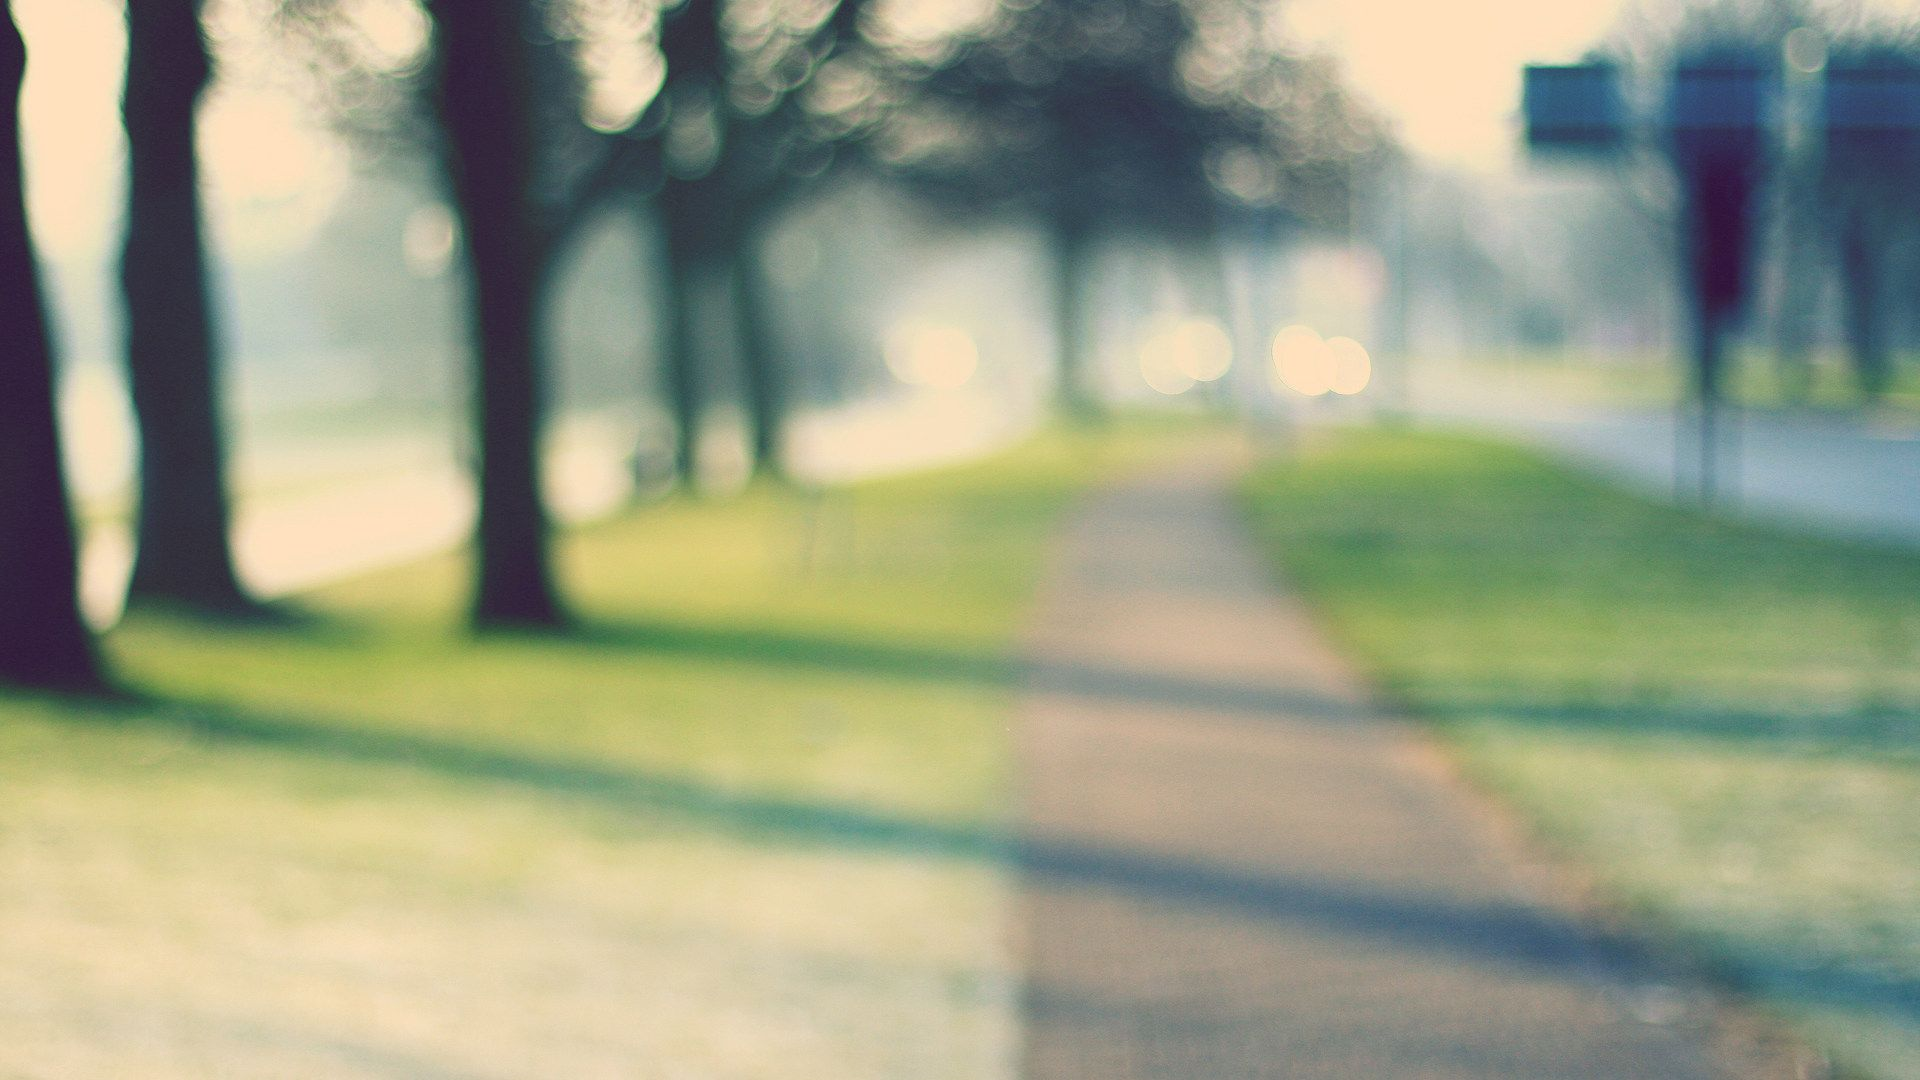 Tumblr Photography Desktop Wallpapers Top Free Tumblr Photography Desktop Backgrounds Wallpaperaccess